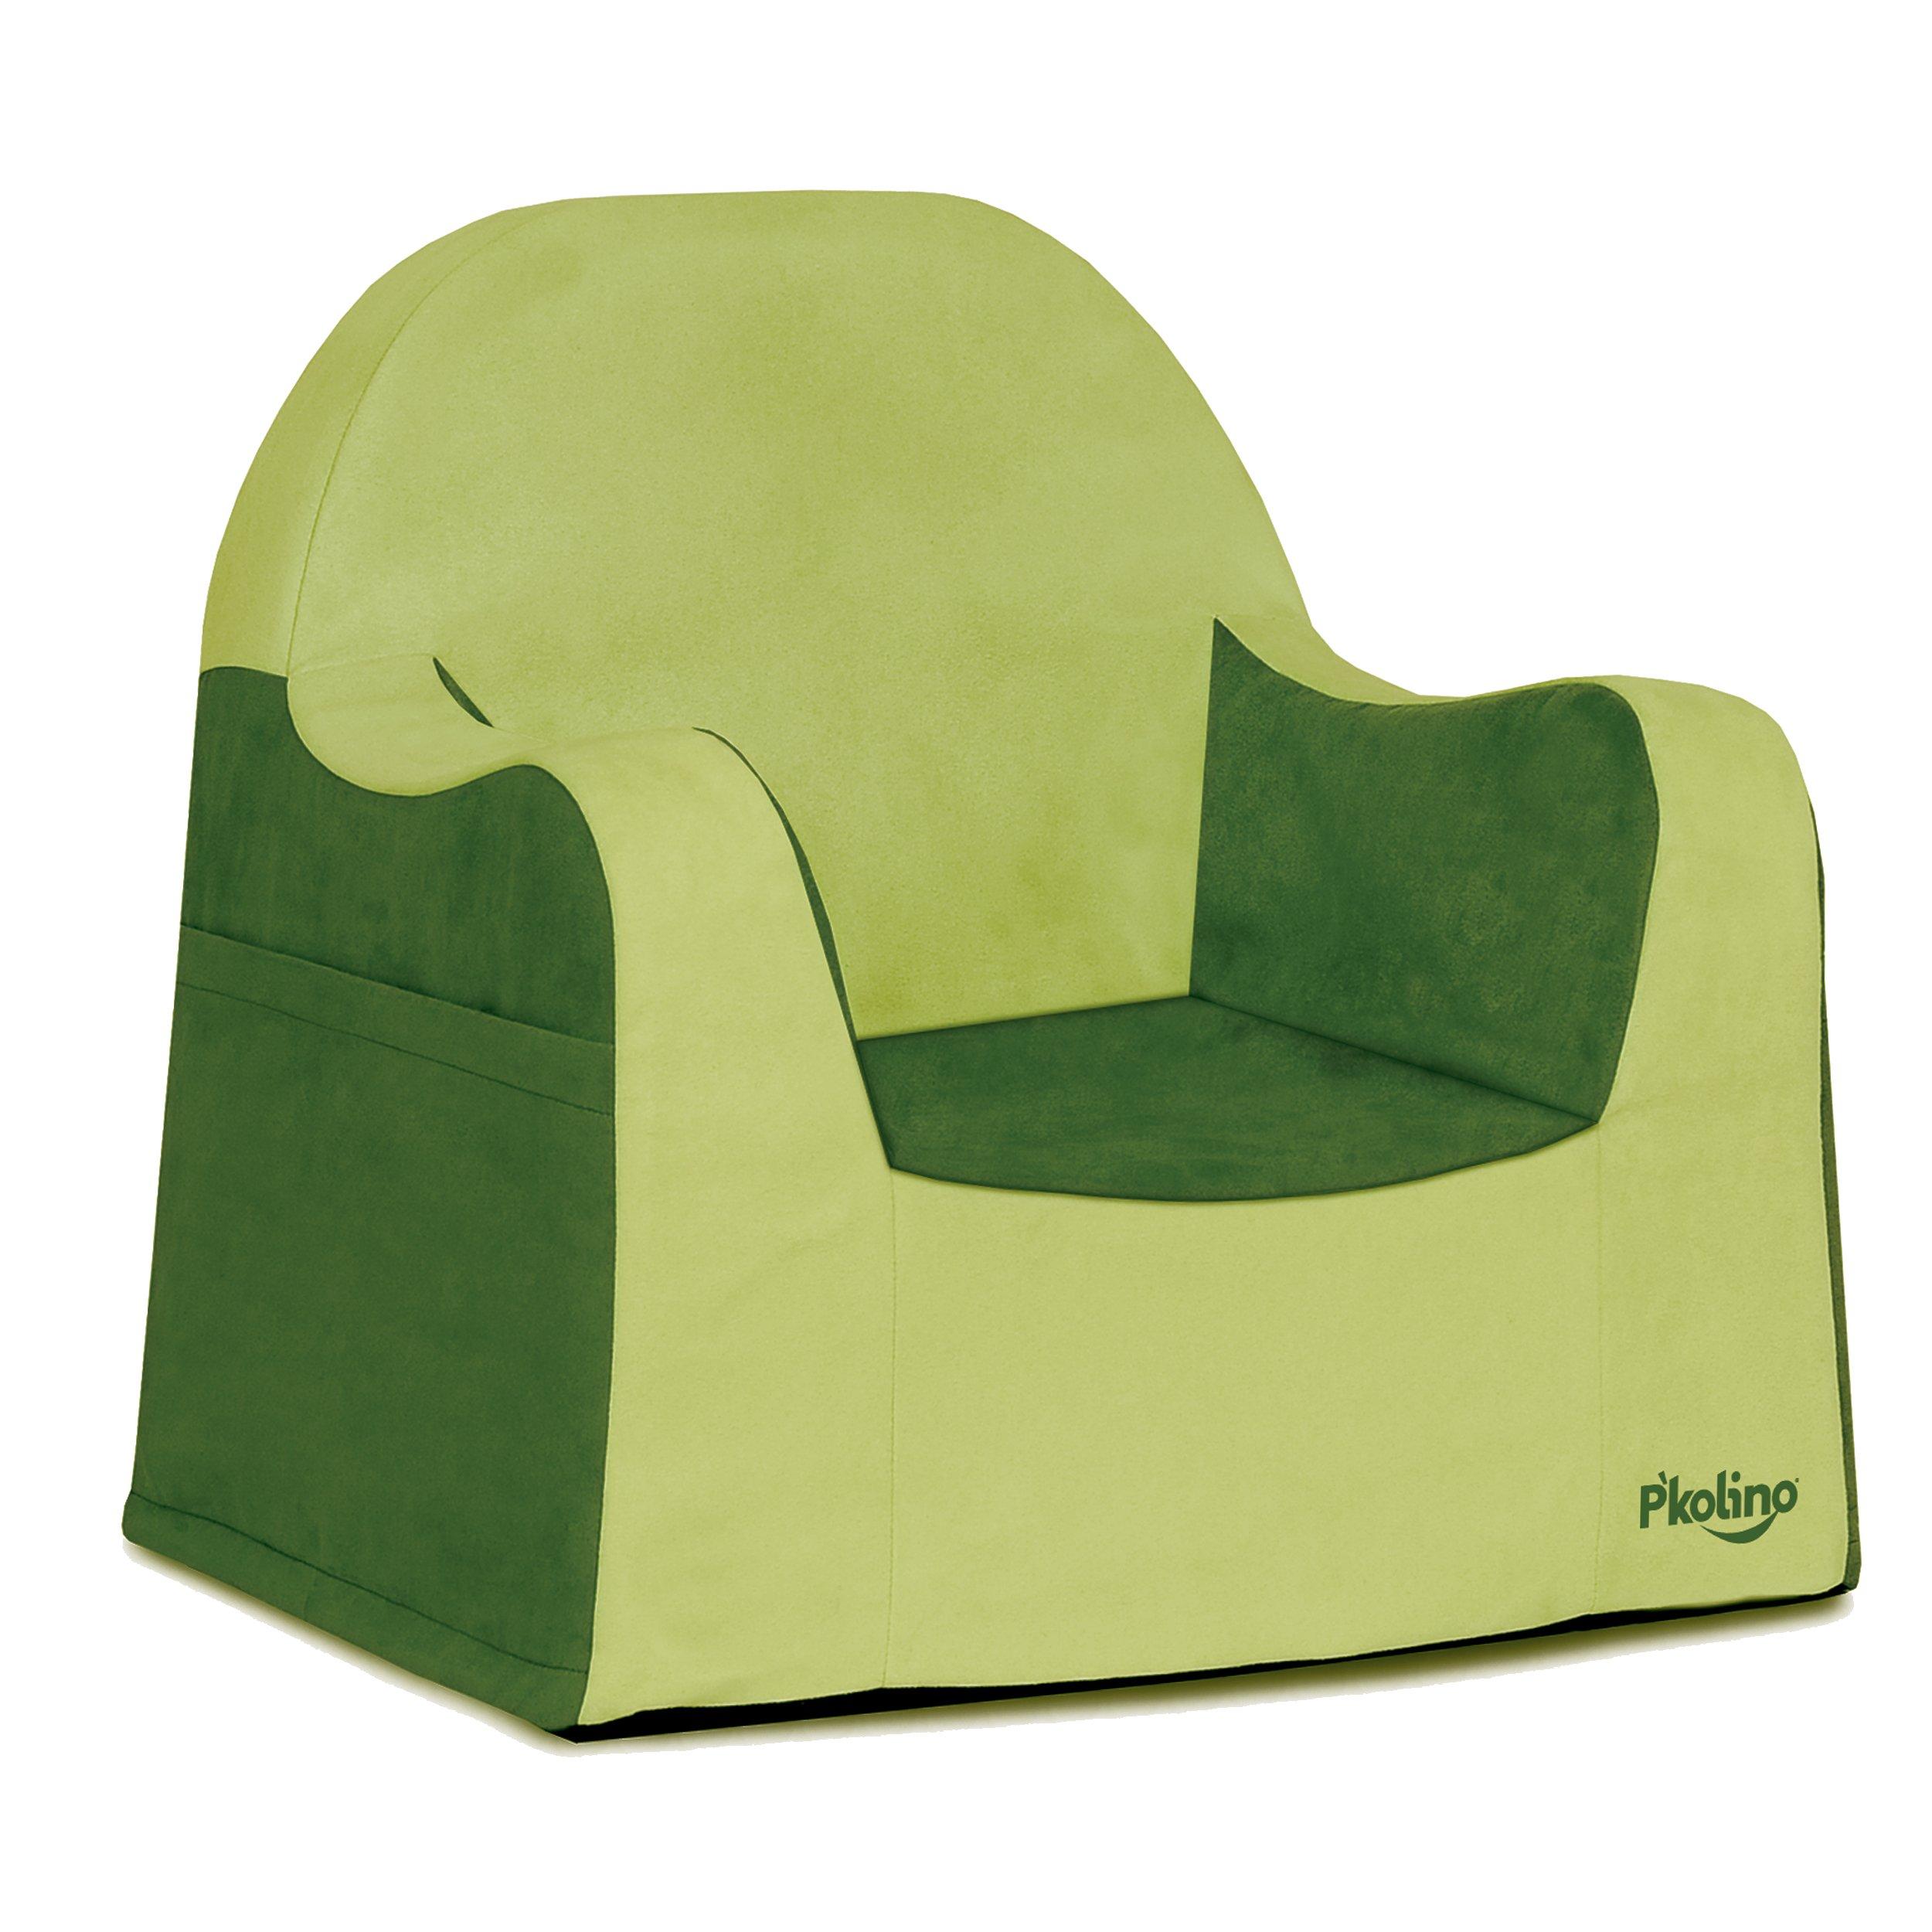 P'kolino Little Reader - Green by P'Kolino